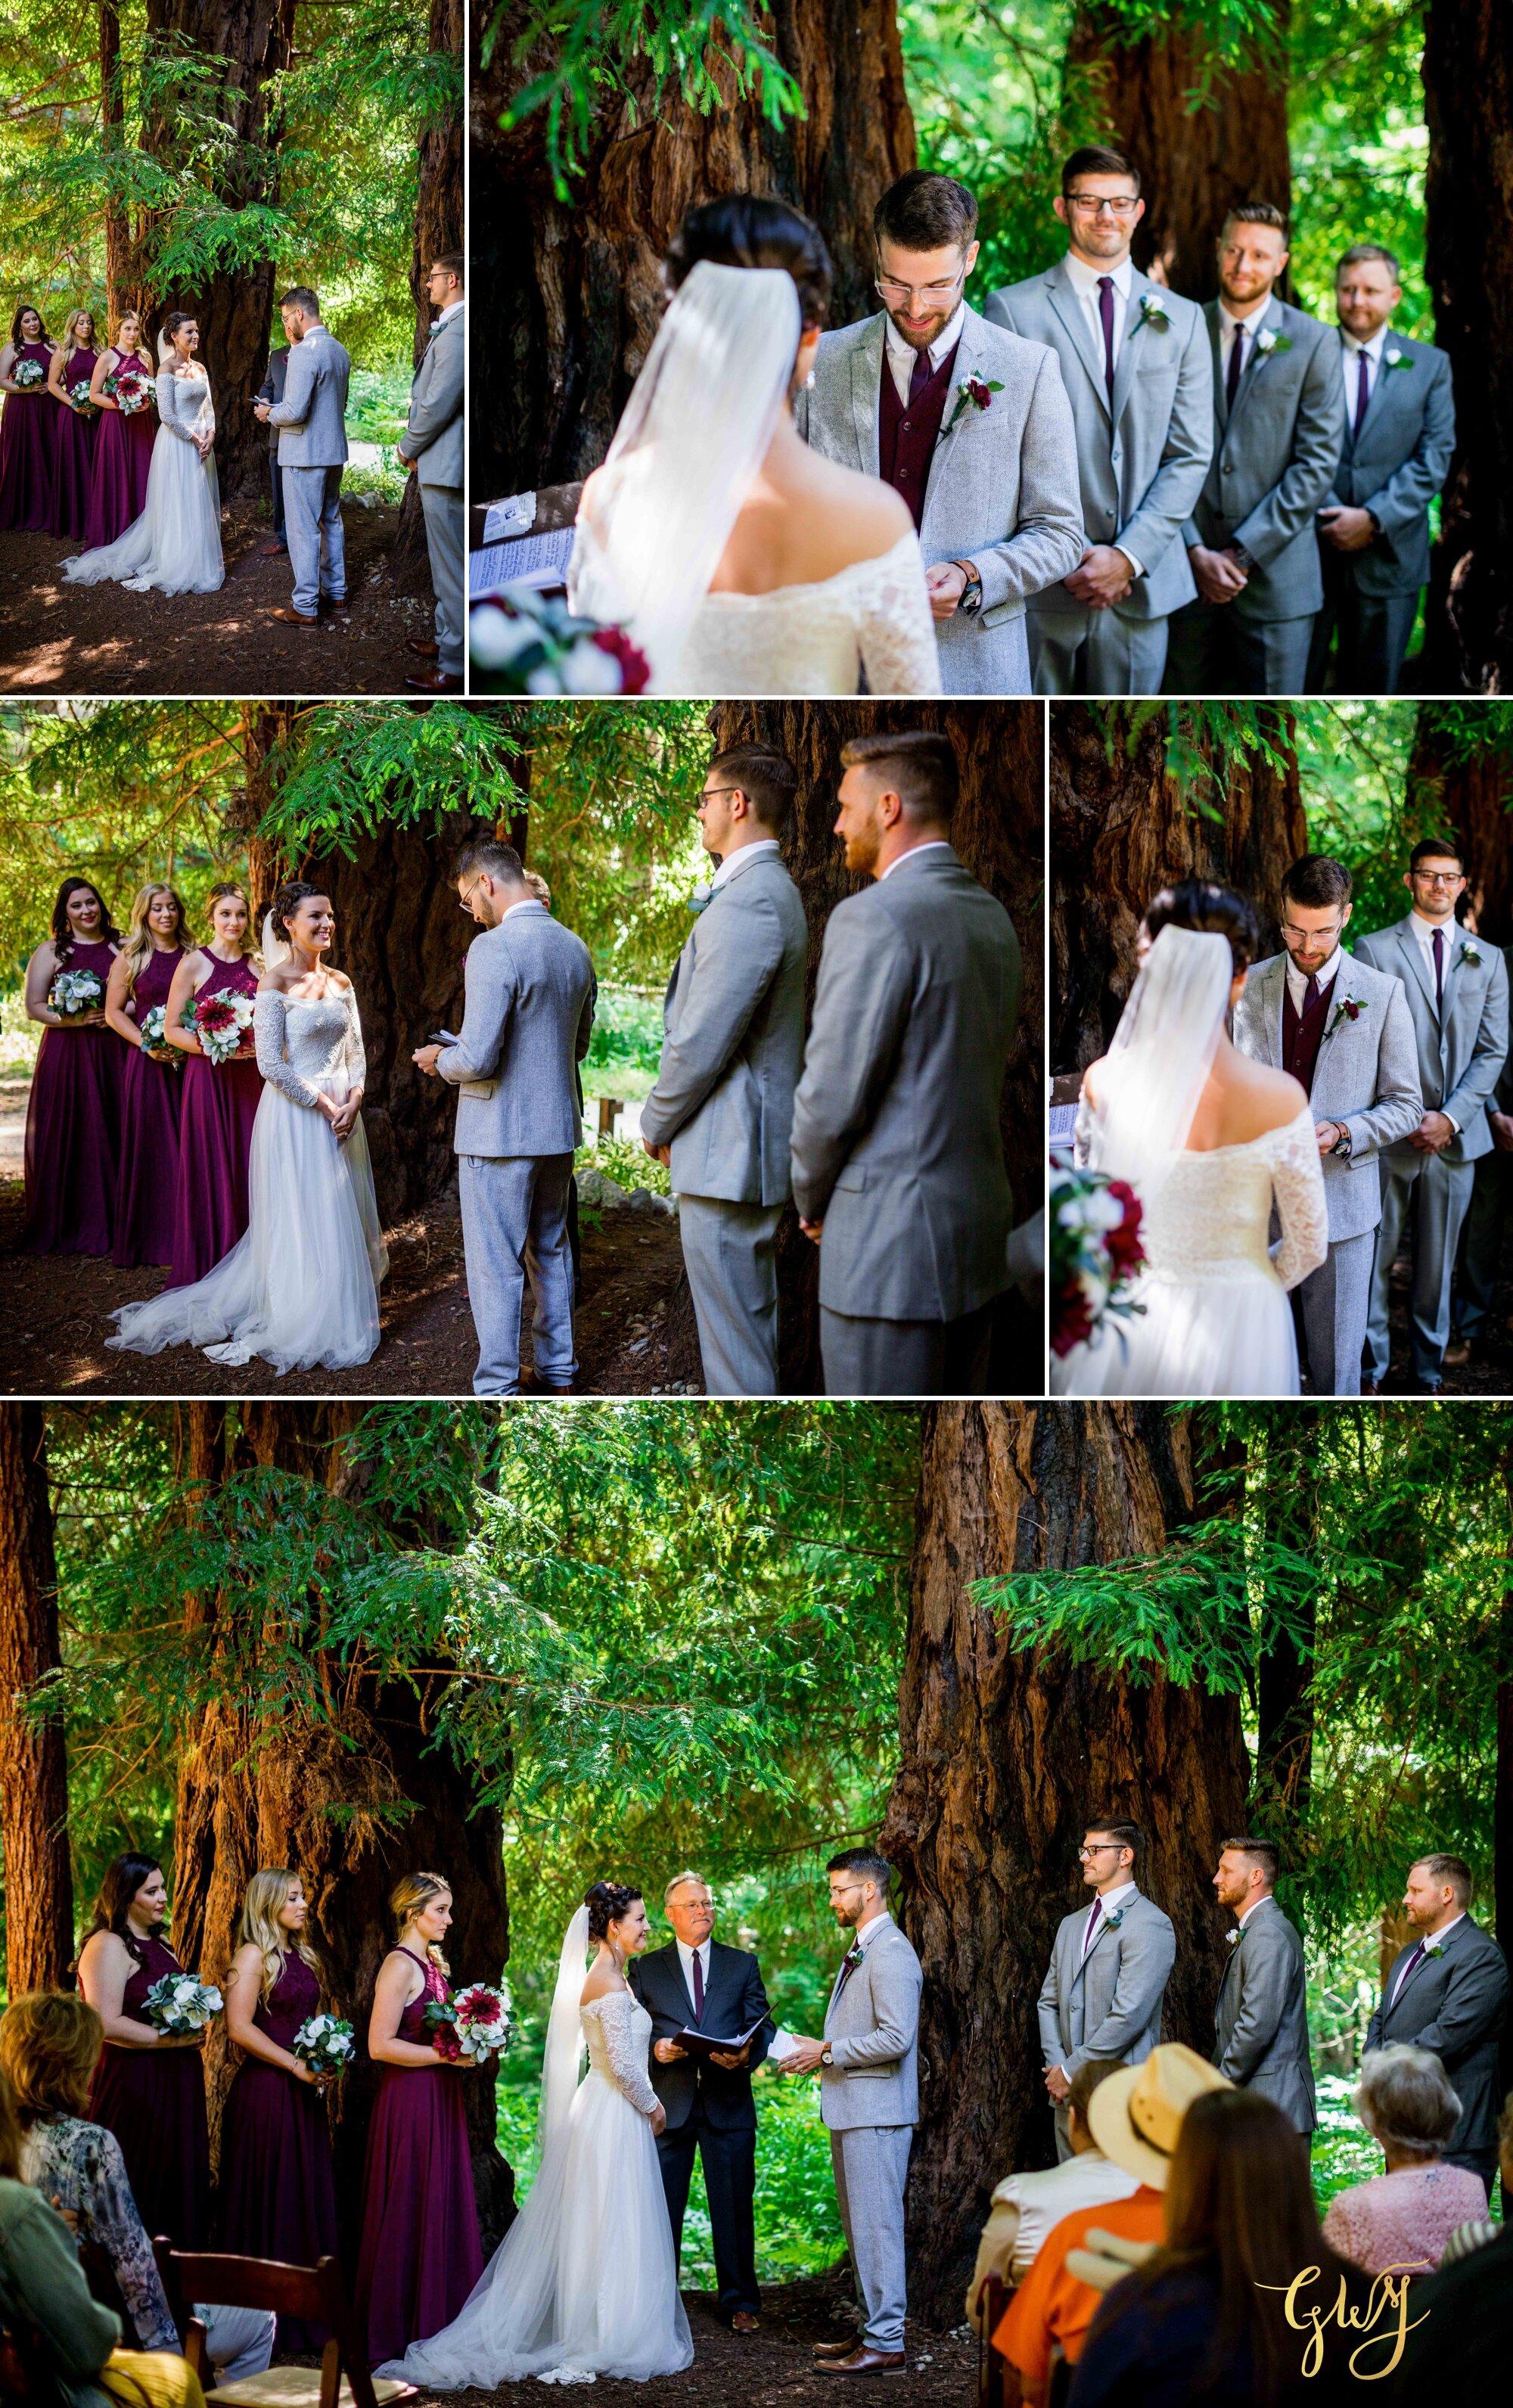 Casey + Jordan's Intimate Big Sur Elopement in the Redwoods by Glass Woods Media 34.jpg